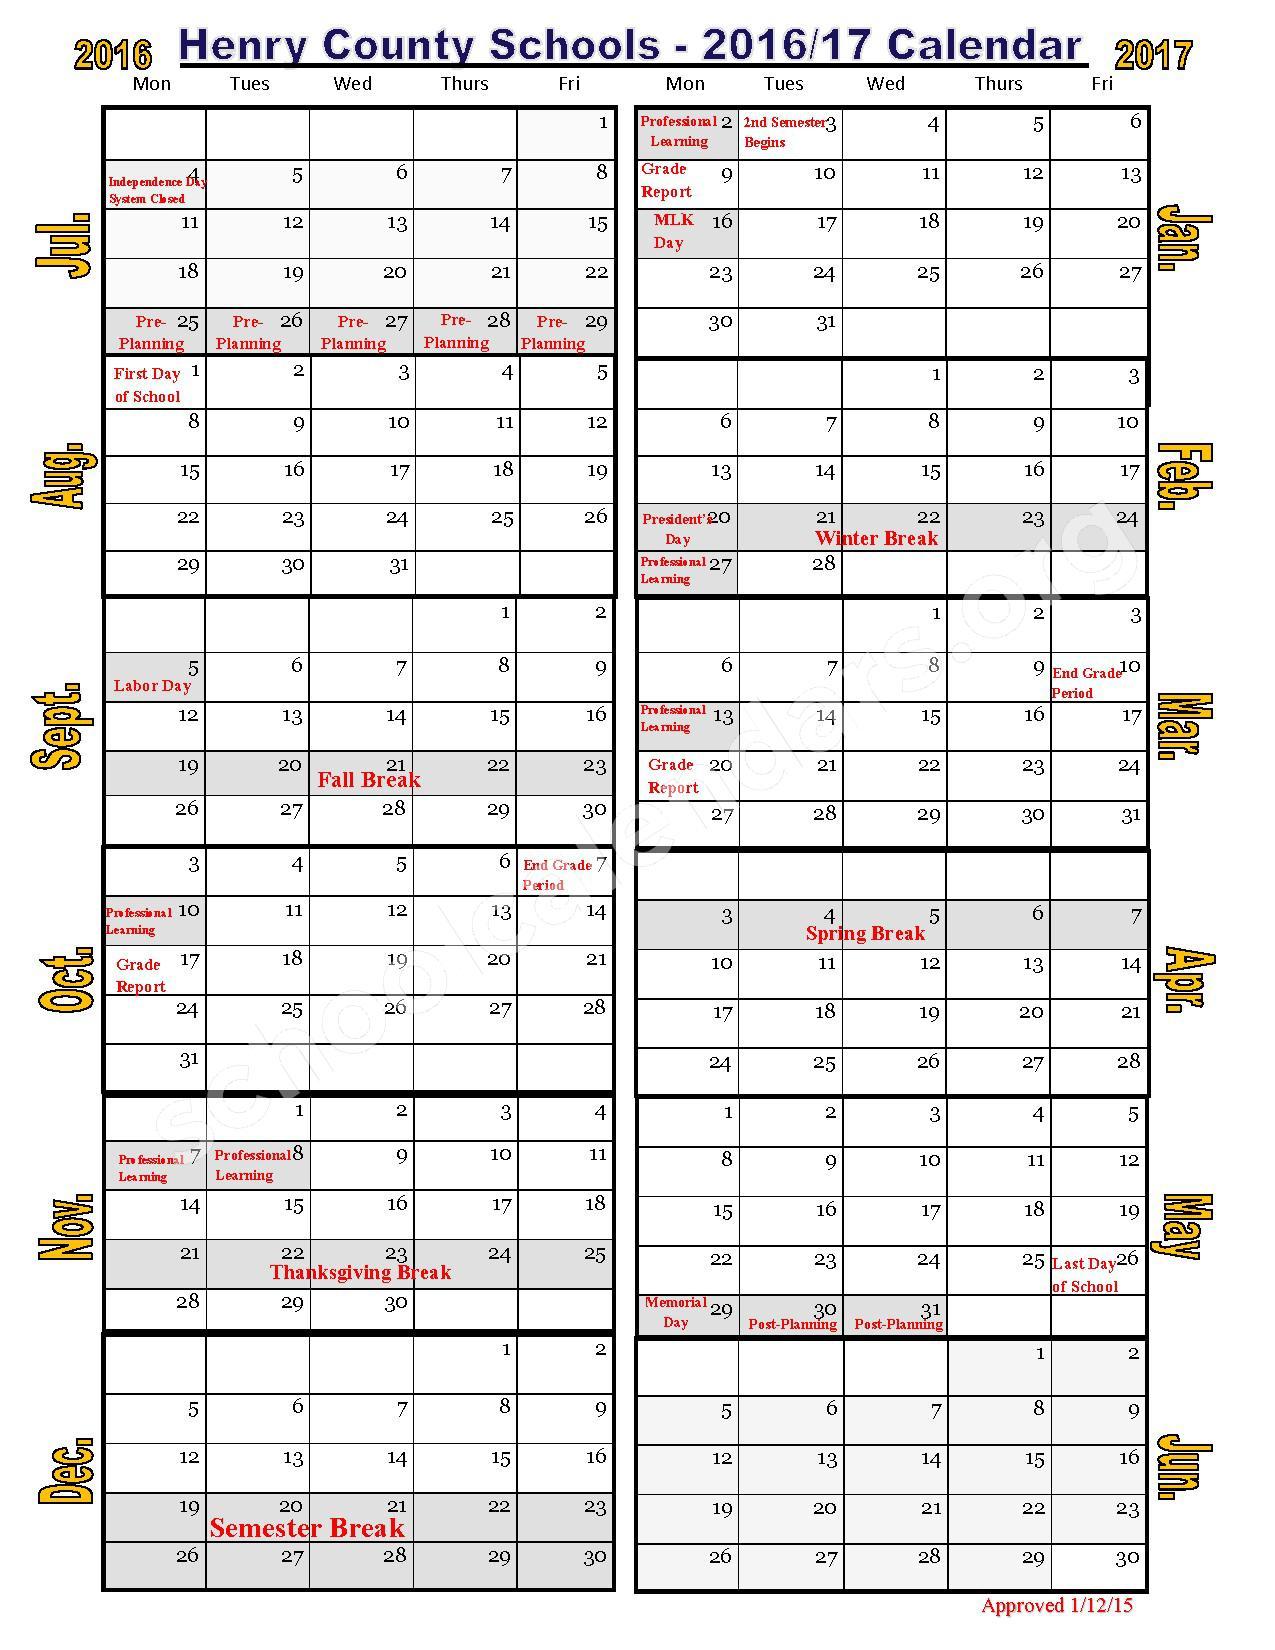 Henry County School Calendar.2016 2017 School Calendar Henry County School District